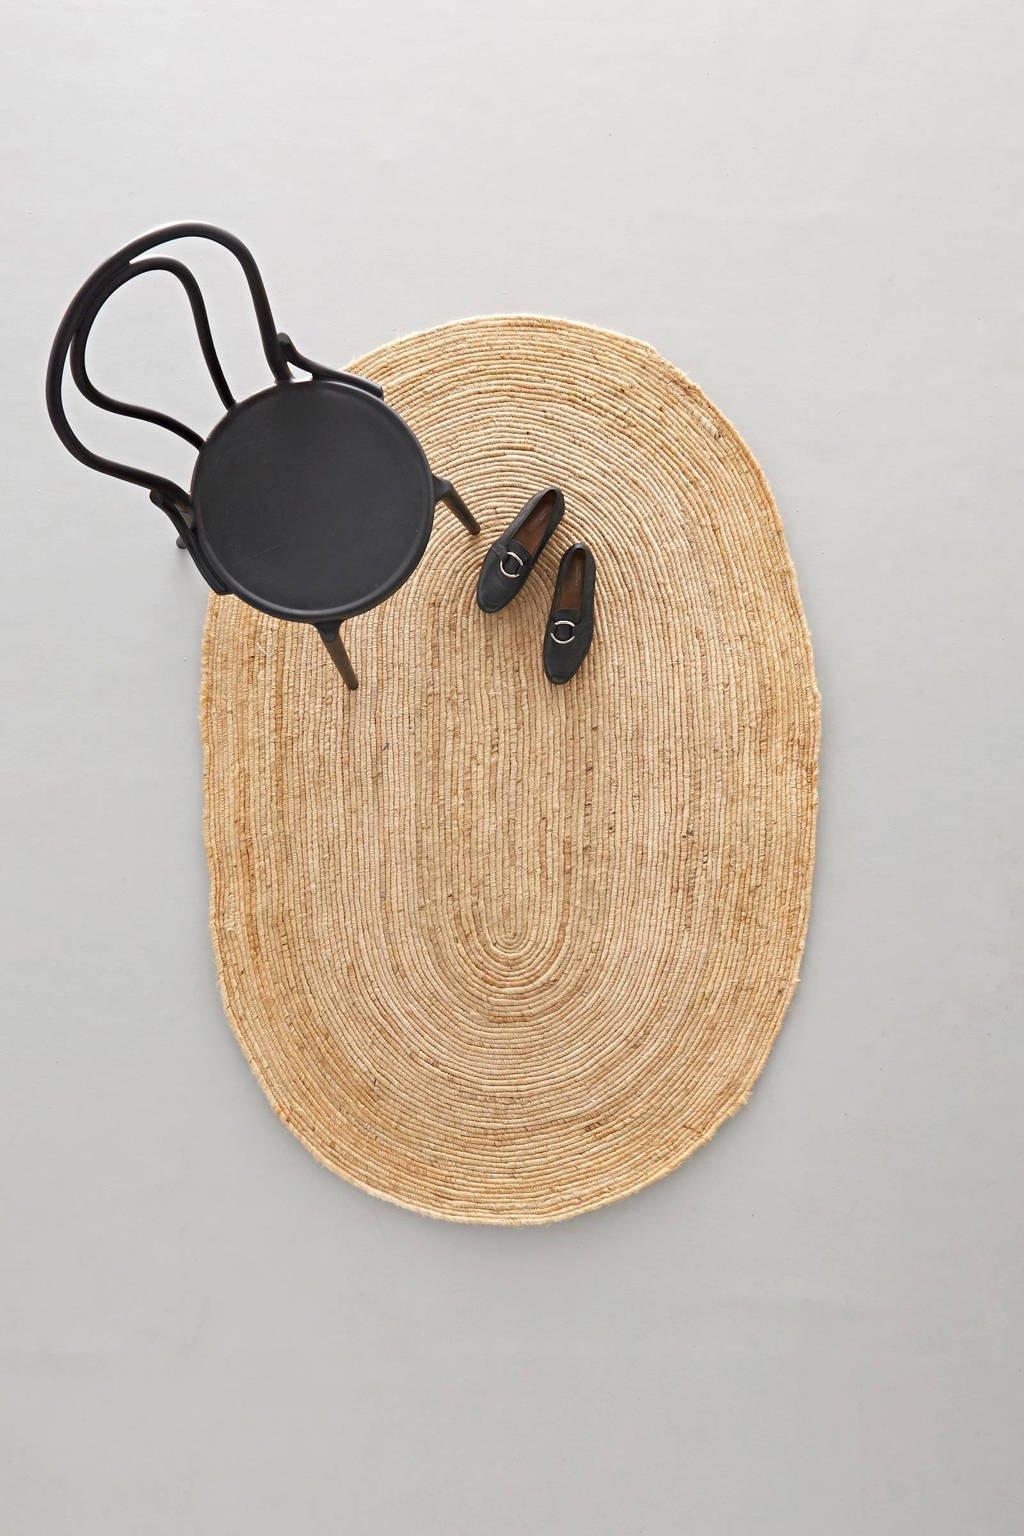 whkmp's own vloerkleed Hiske  (180x120 cm)